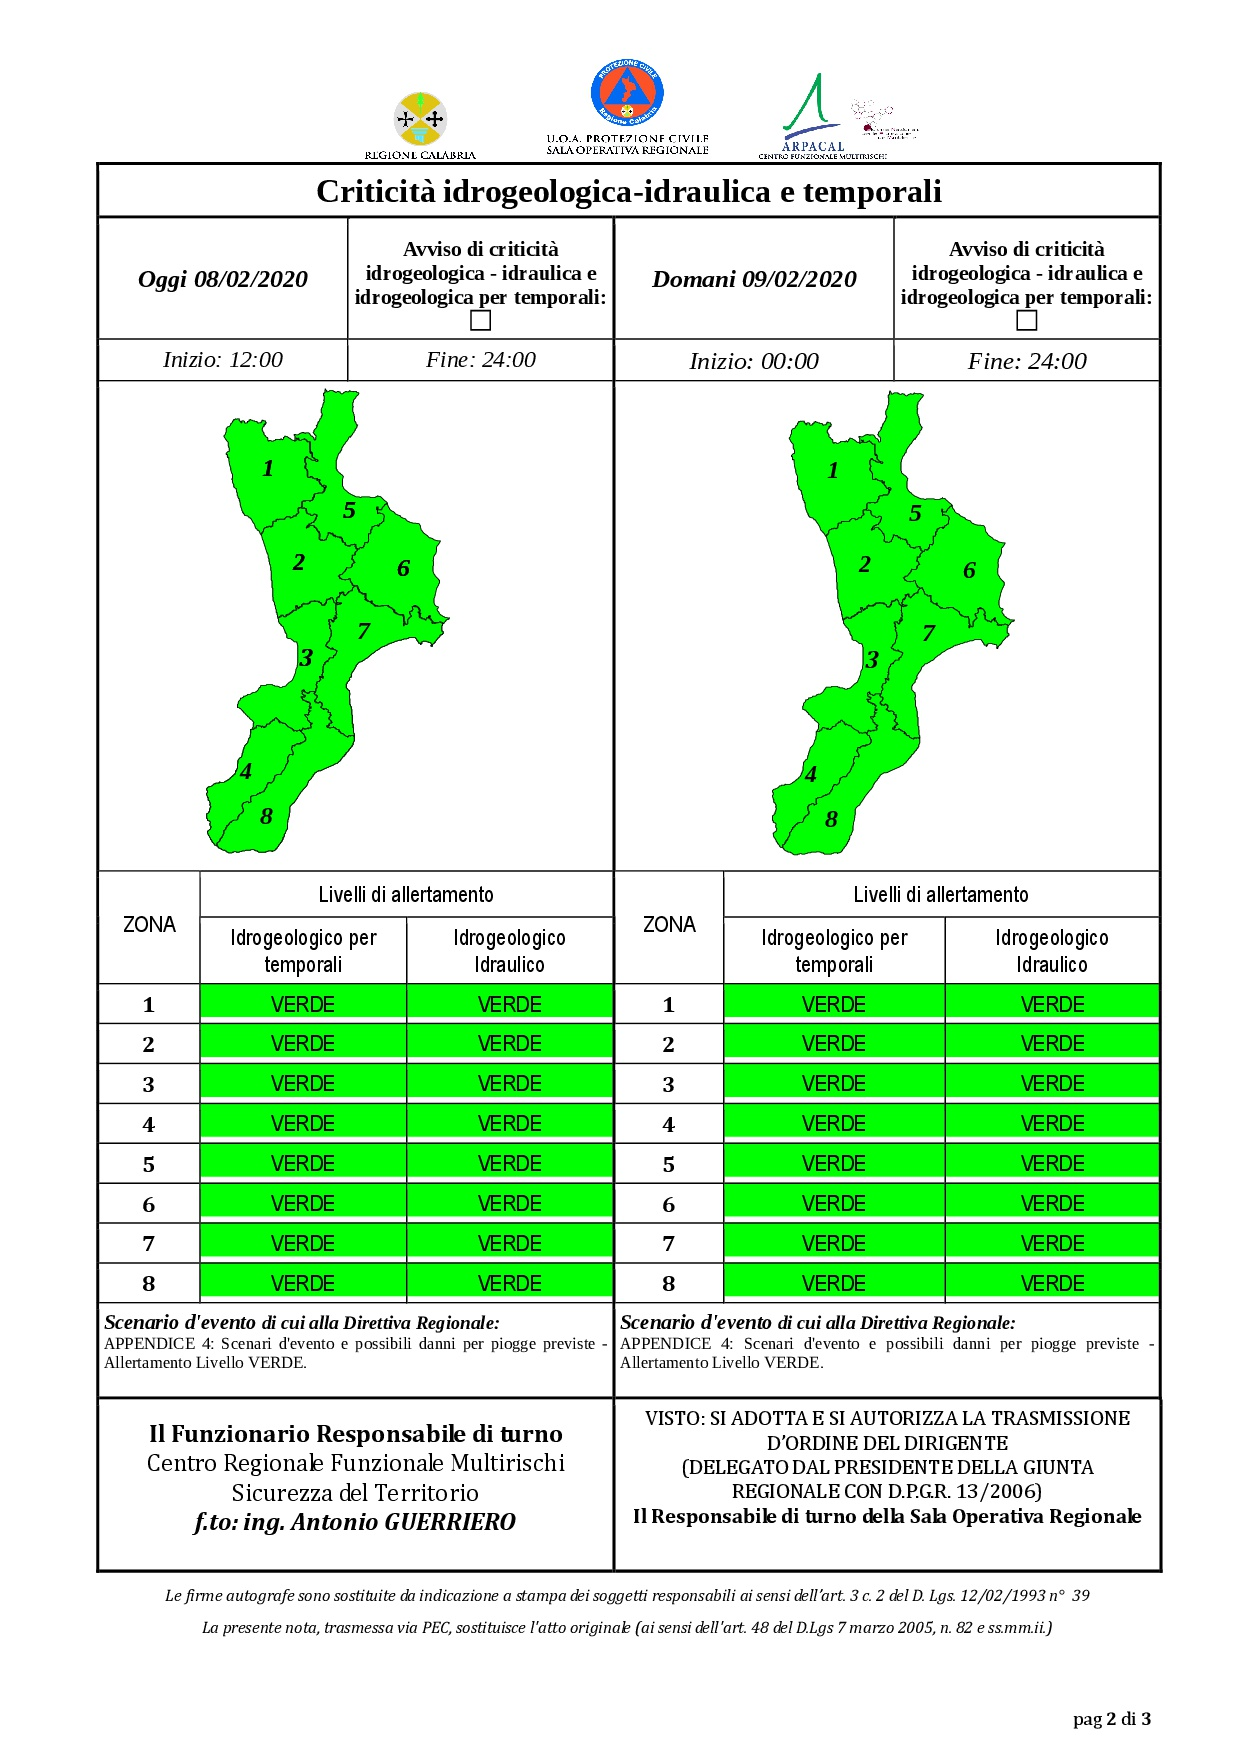 Criticità idrogeologica-idraulica e temporali in Calabria 08-02-2020